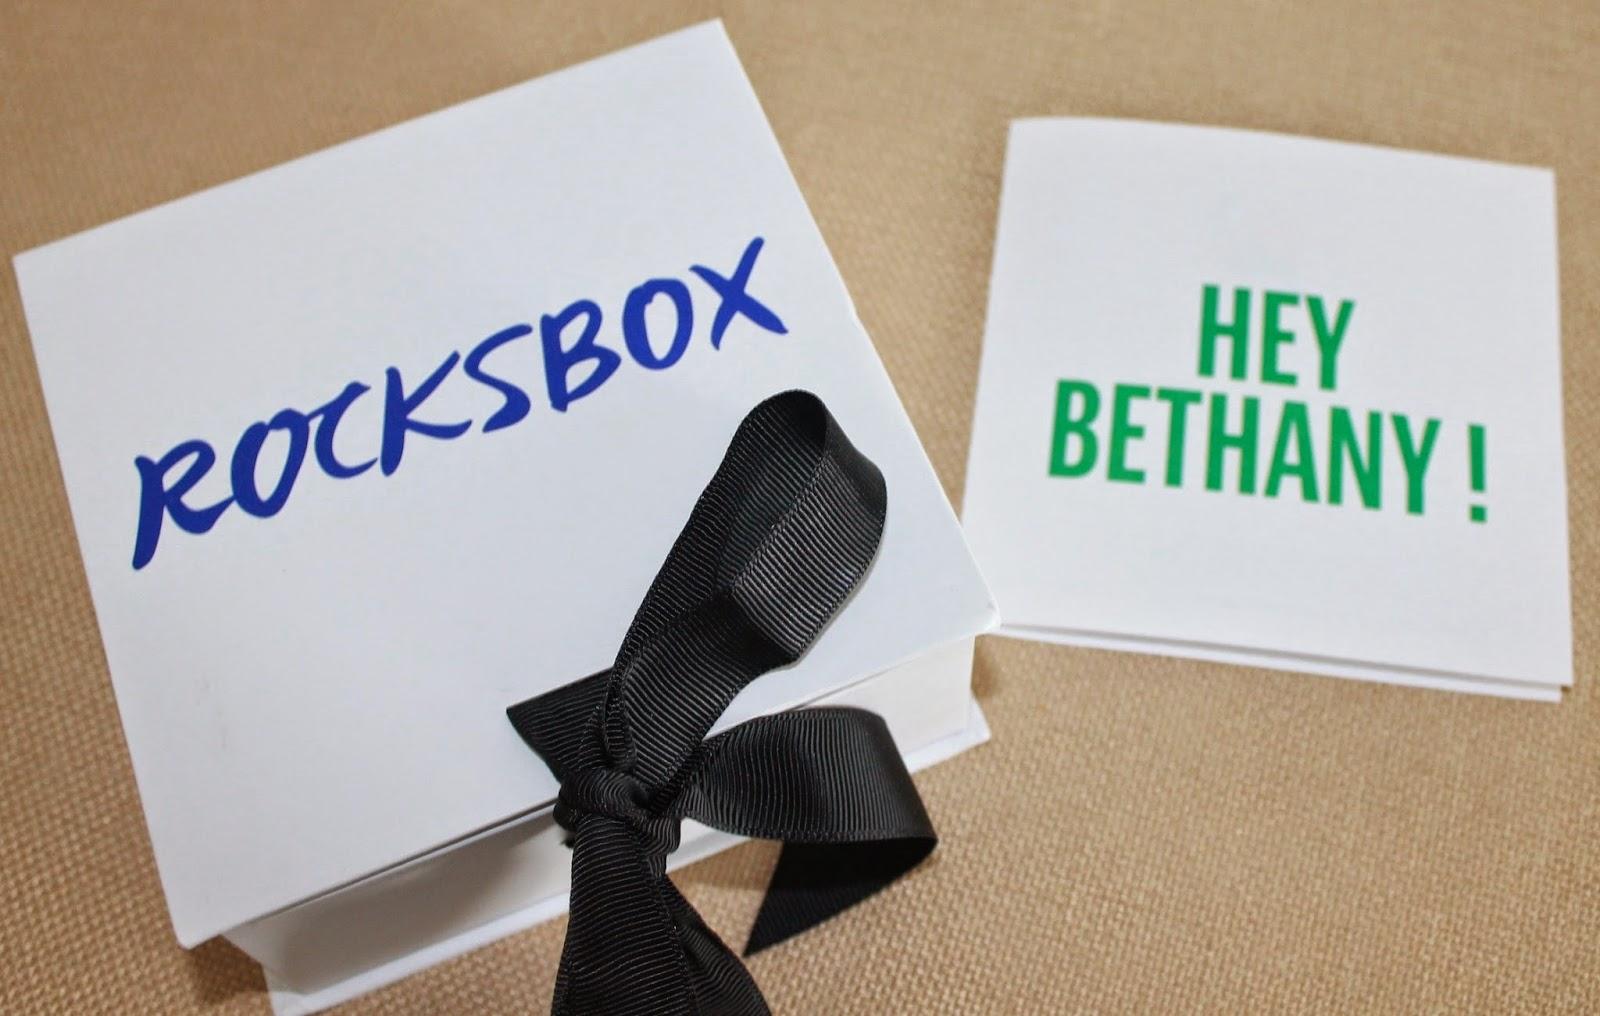 rocksbox 1st month free promo code